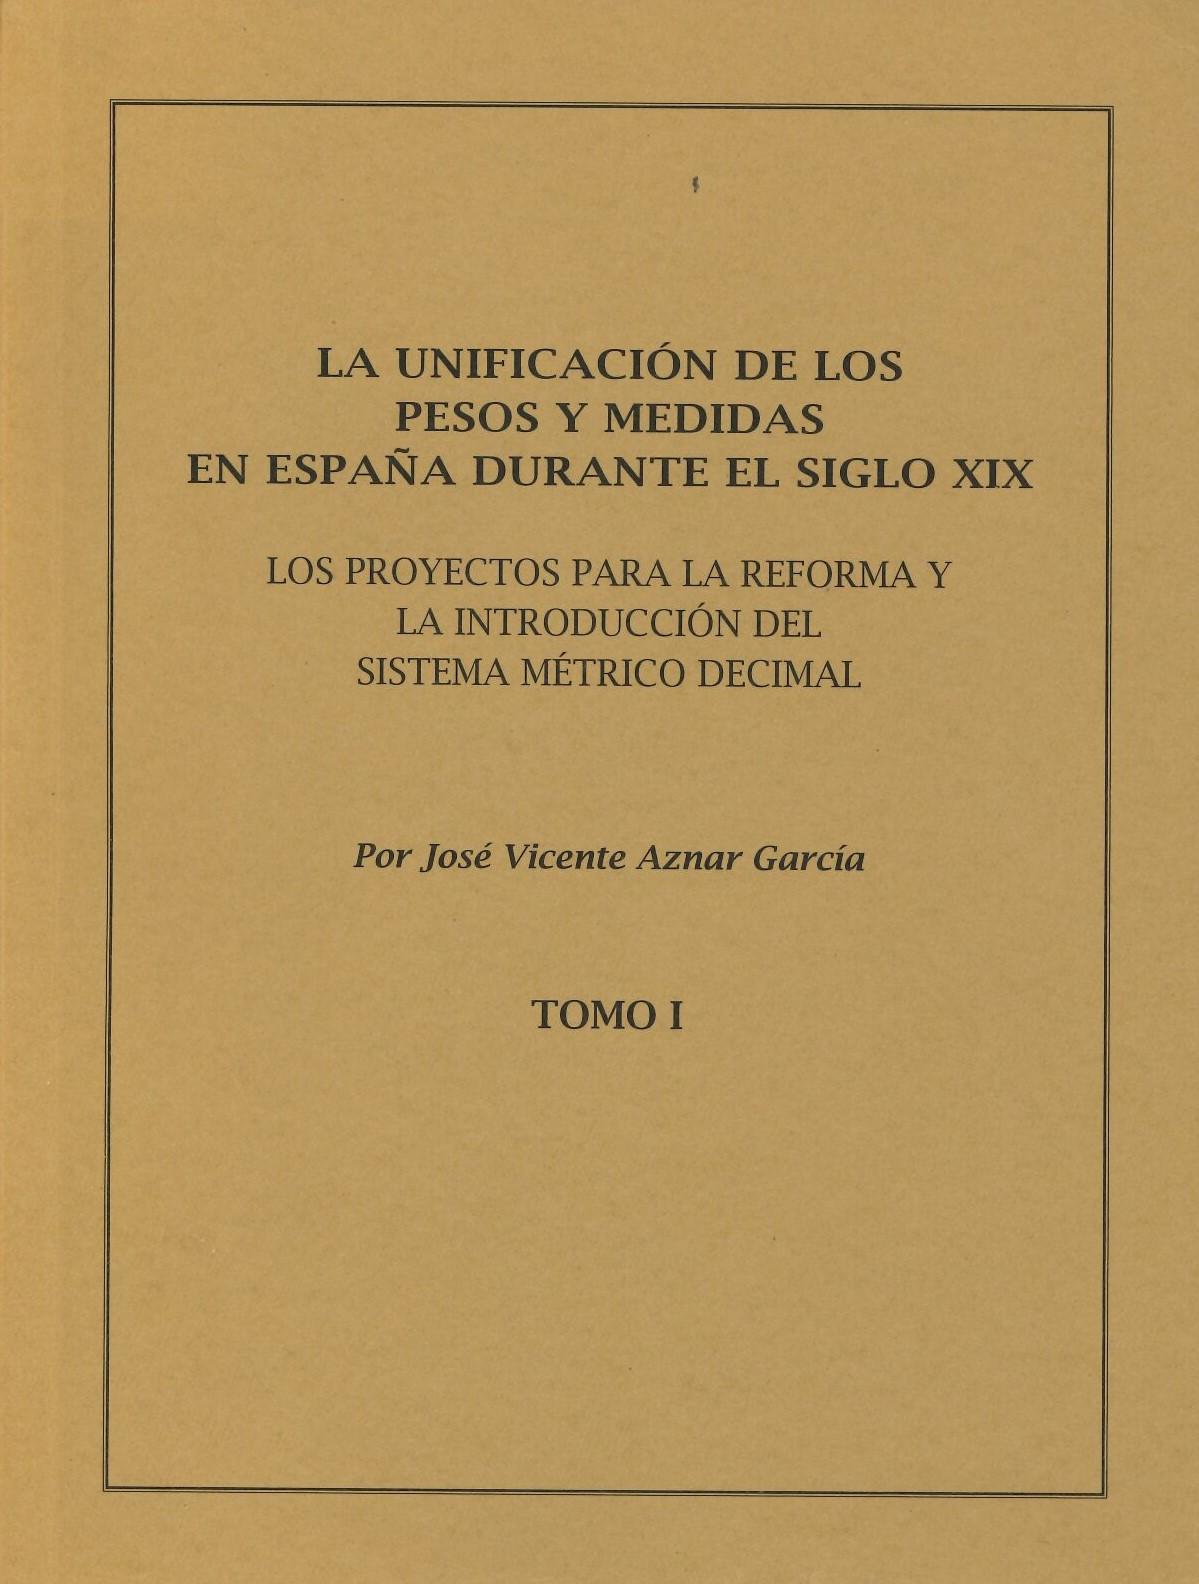 unificacion_pesos_medidas.jpg